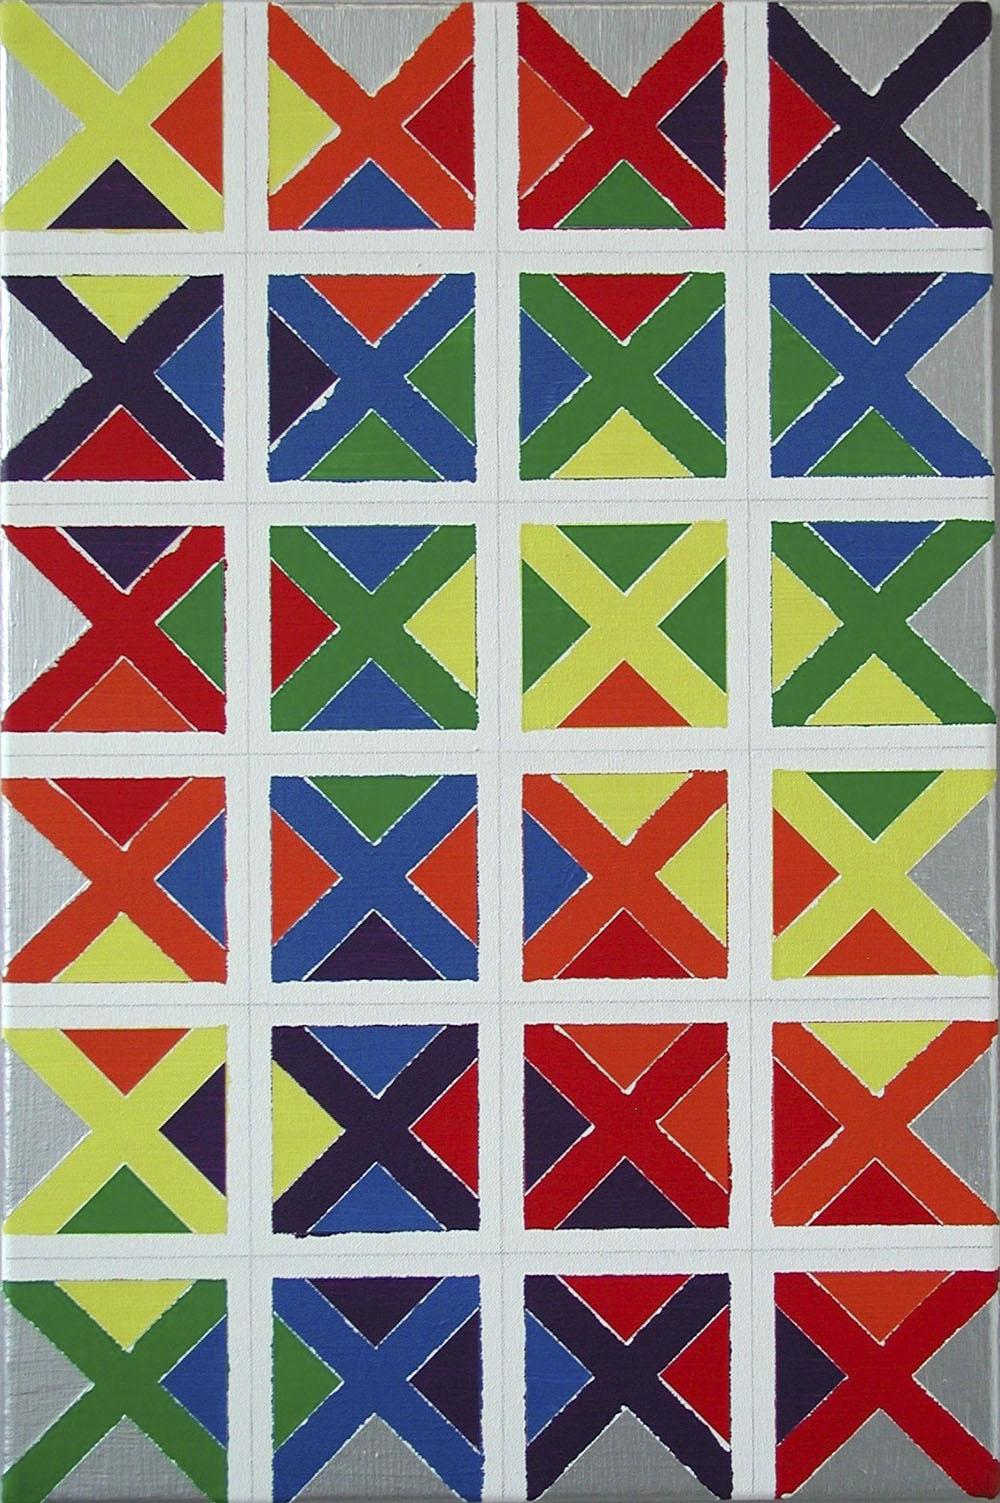 dezimal-33 | Acryl auf Leinwand | 2002 | 60 x 40 cm